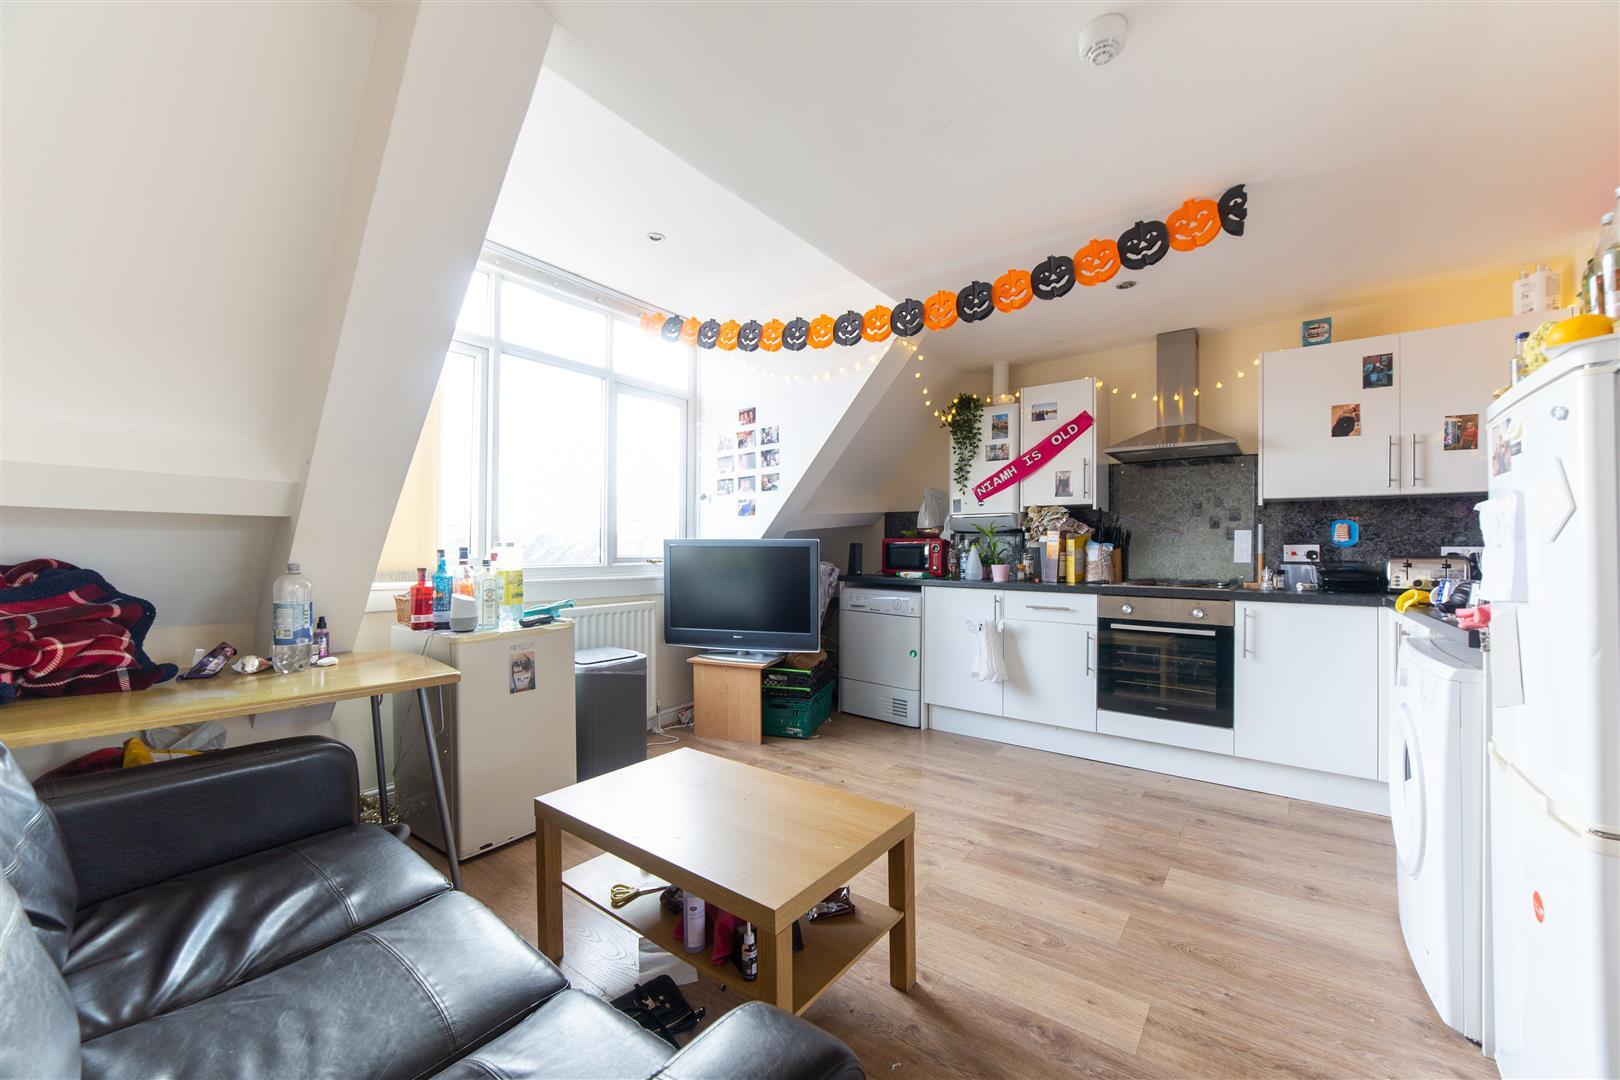 3 bed apartment to rent in Newcastle Upon Tyne, NE2 2AJ, NE2